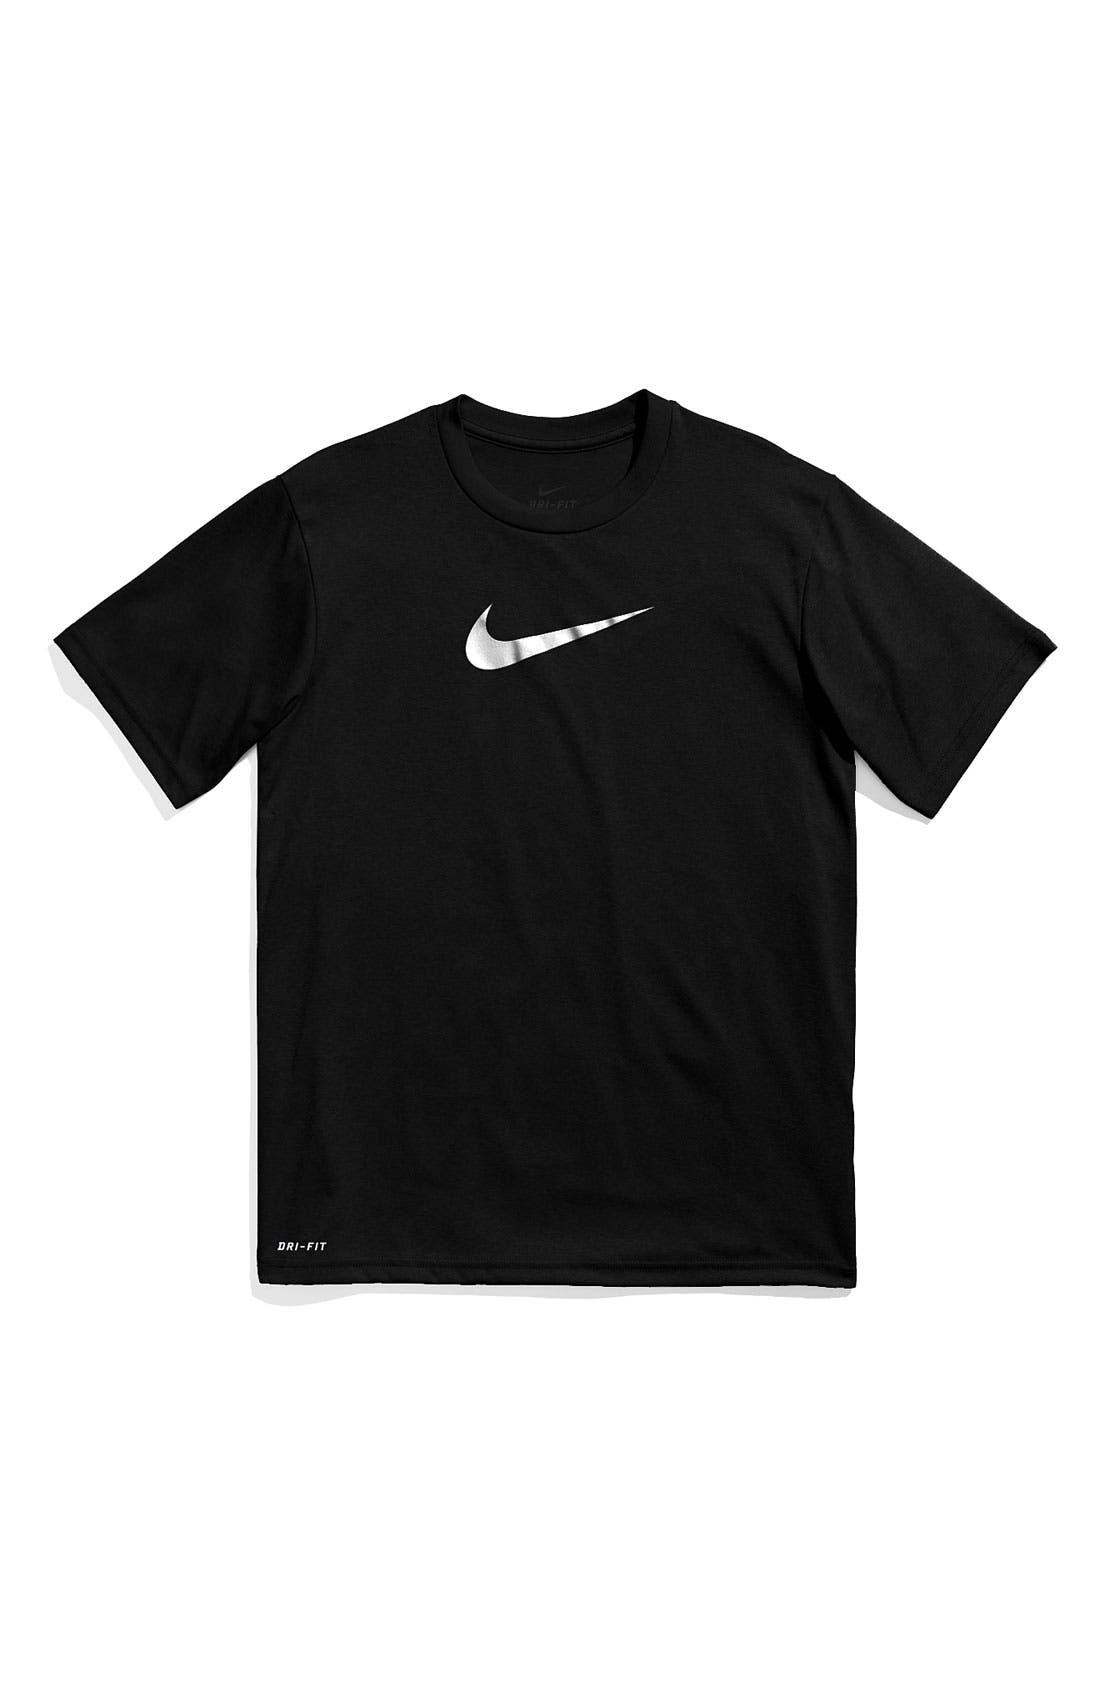 Main Image - Nike Dri-FIT Crewneck T-Shirt (Big Boys)